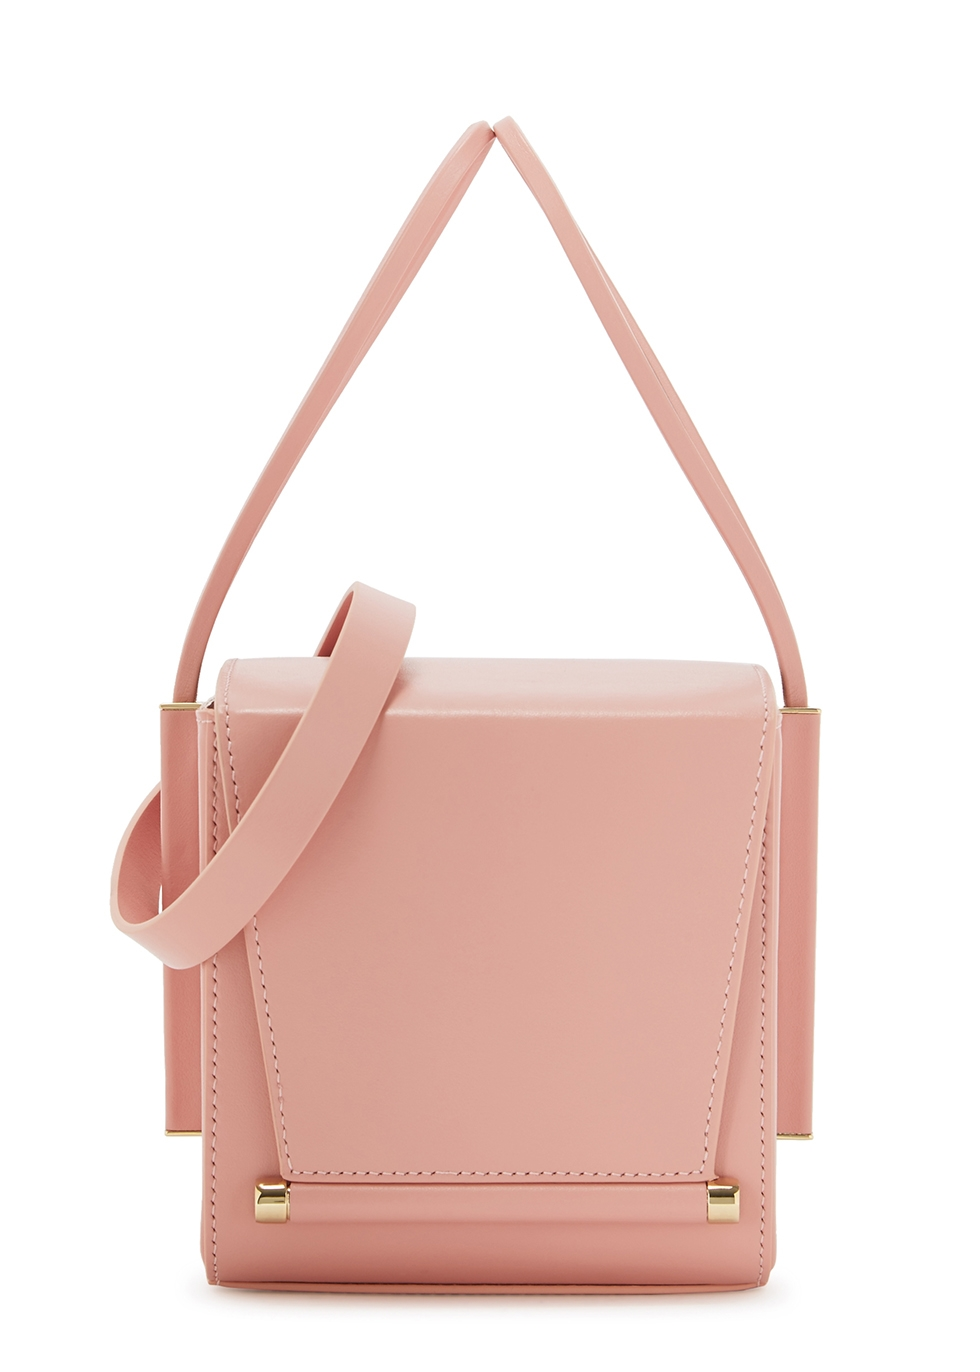 2ba3033c0f42 Women s Designer Bags